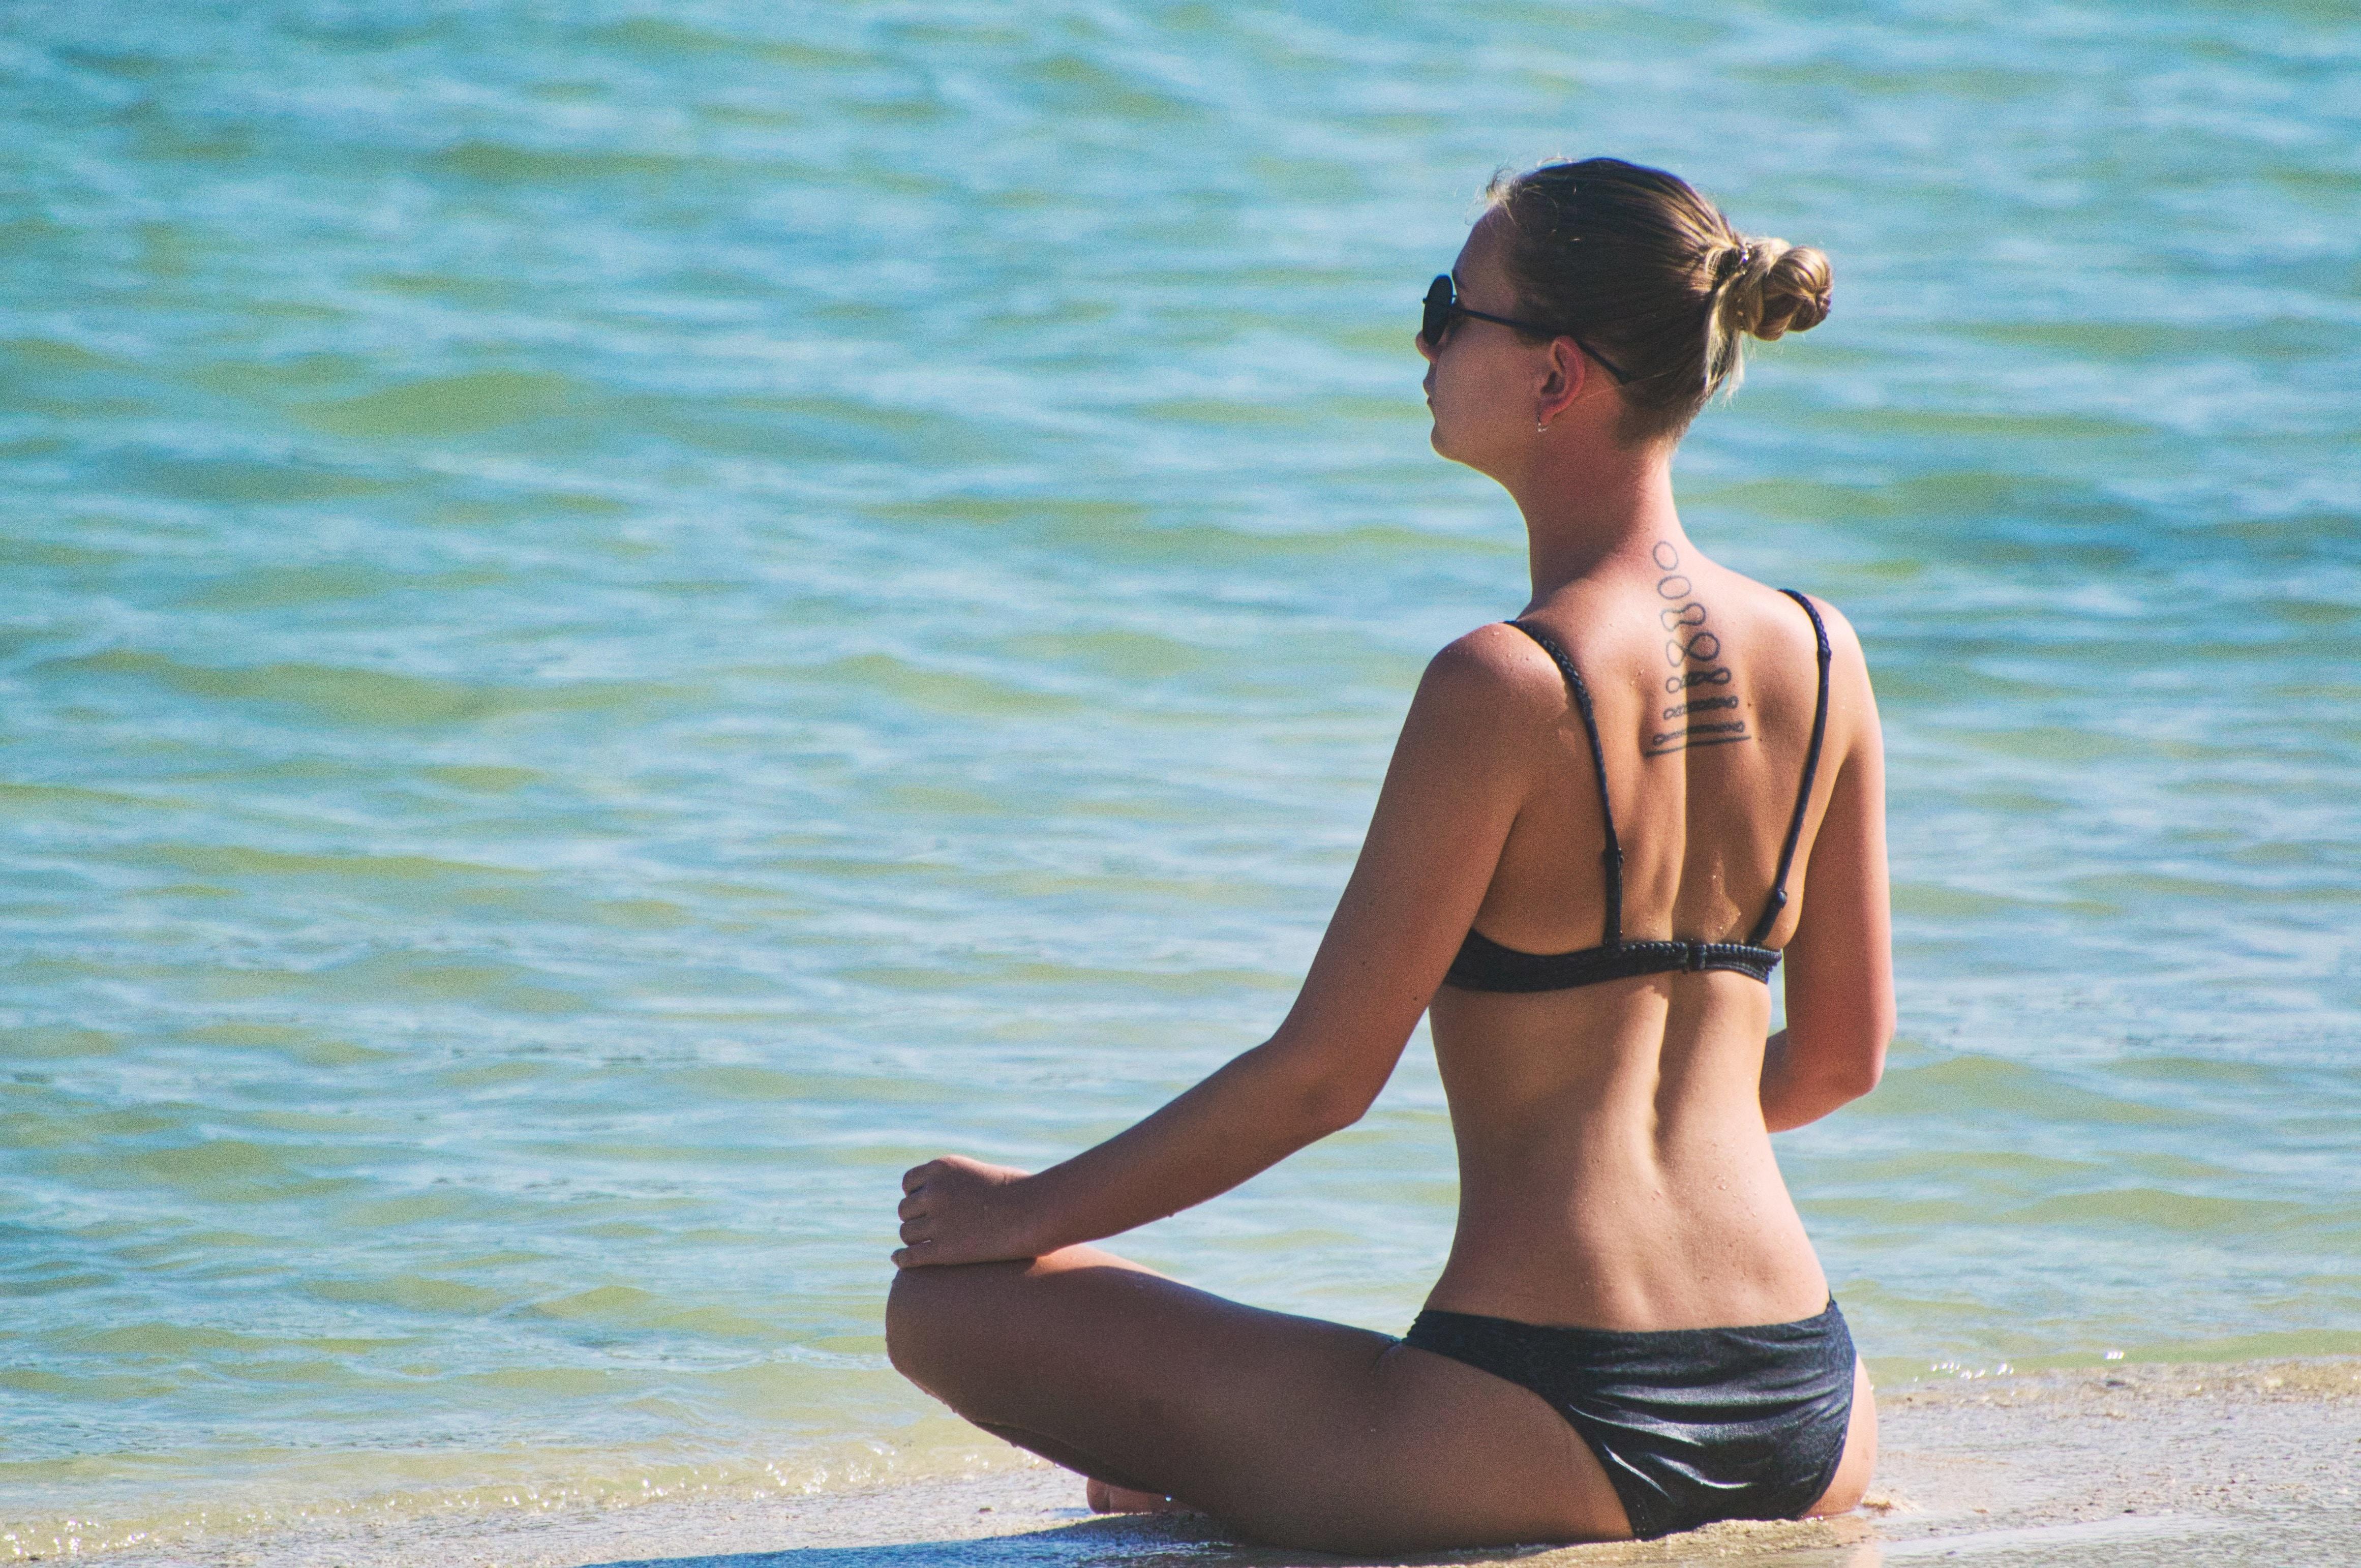 Femme assise devant l'océan